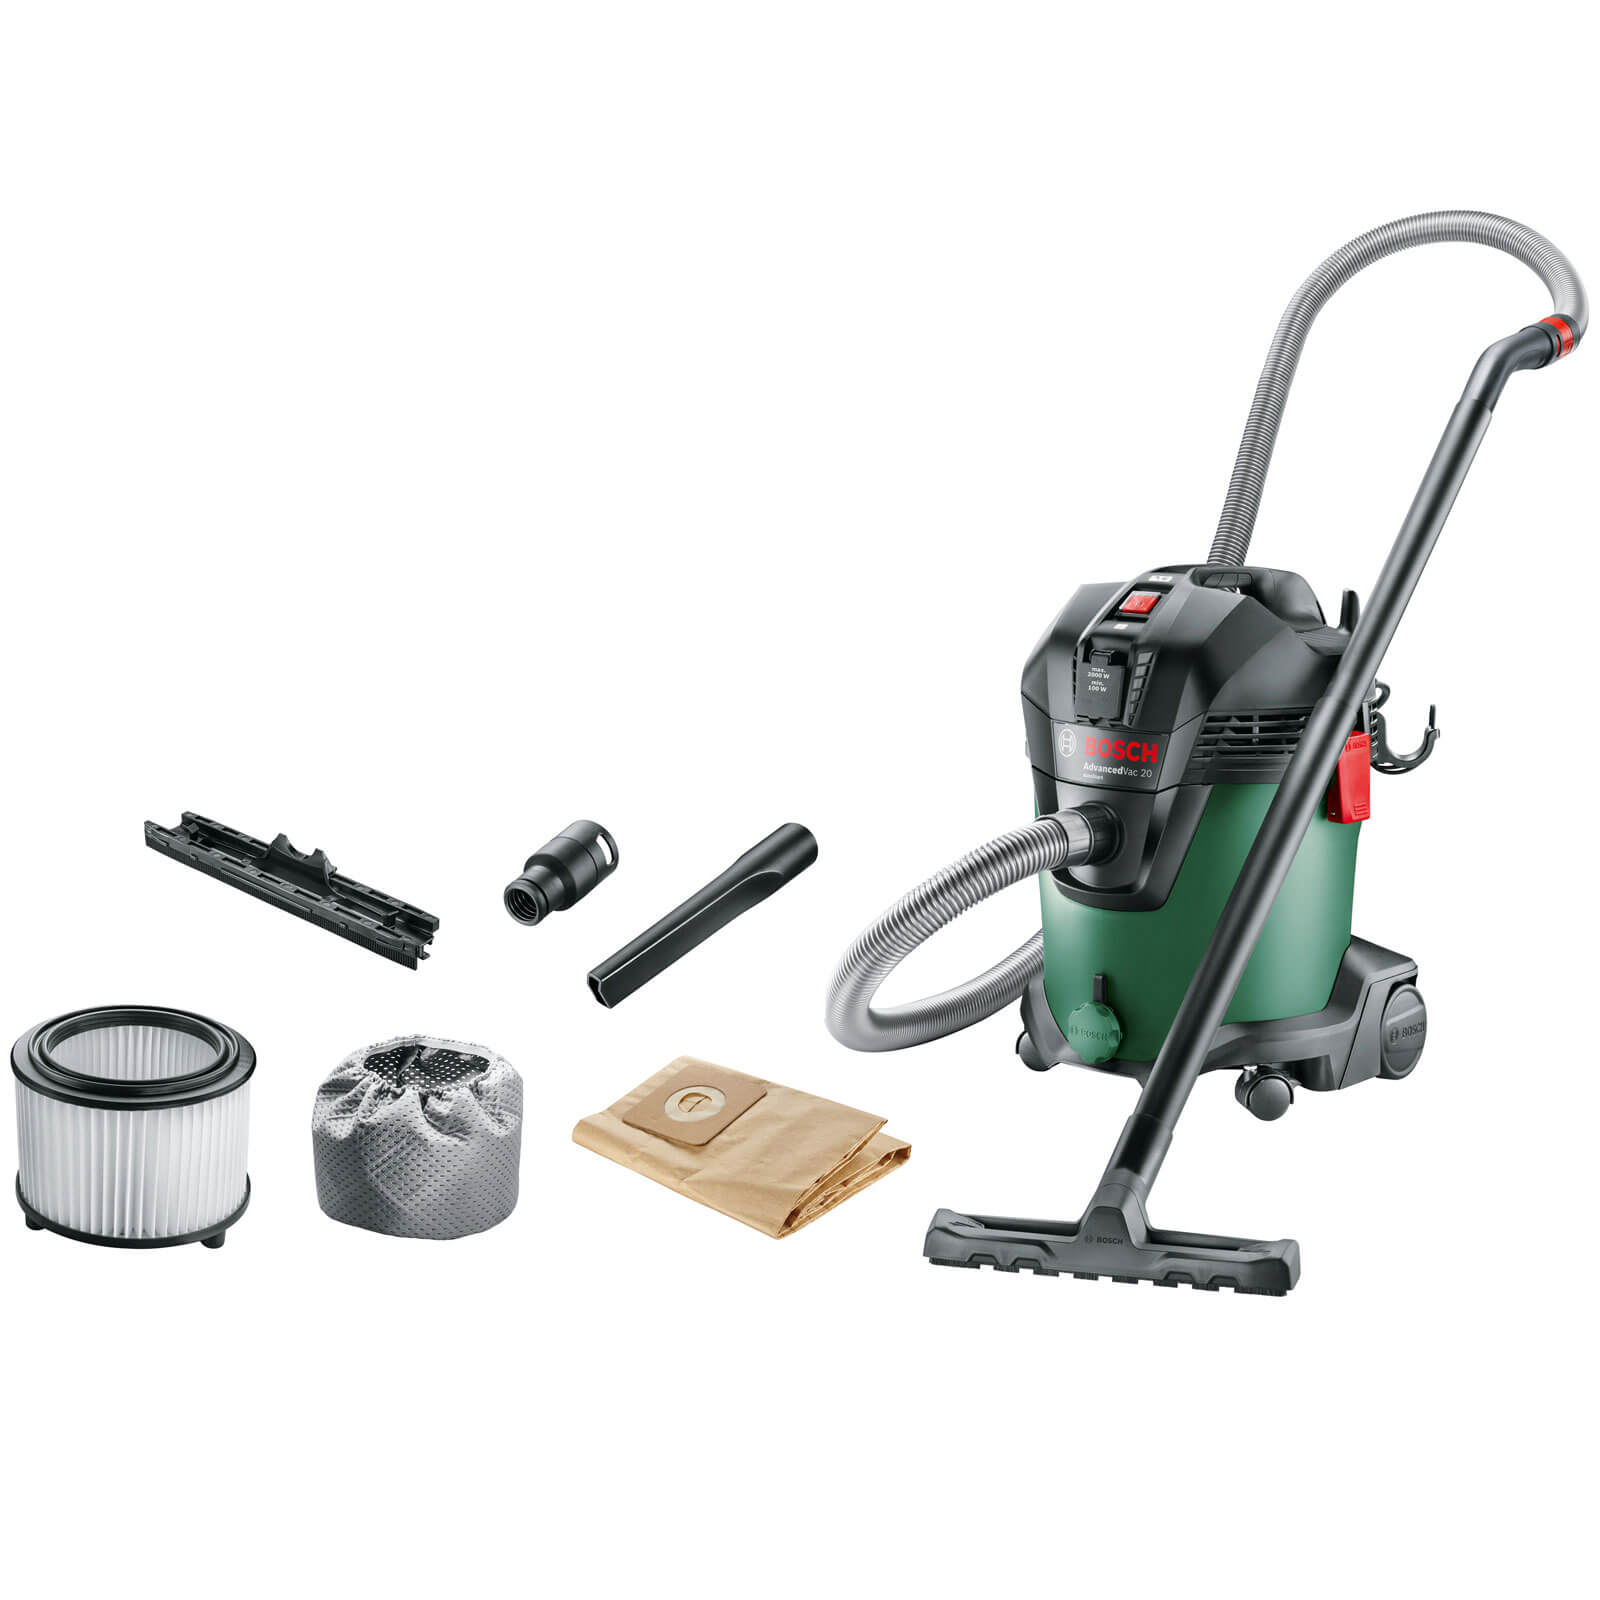 Bosch AdvancedVac 20 Wet & Dry Vacuum